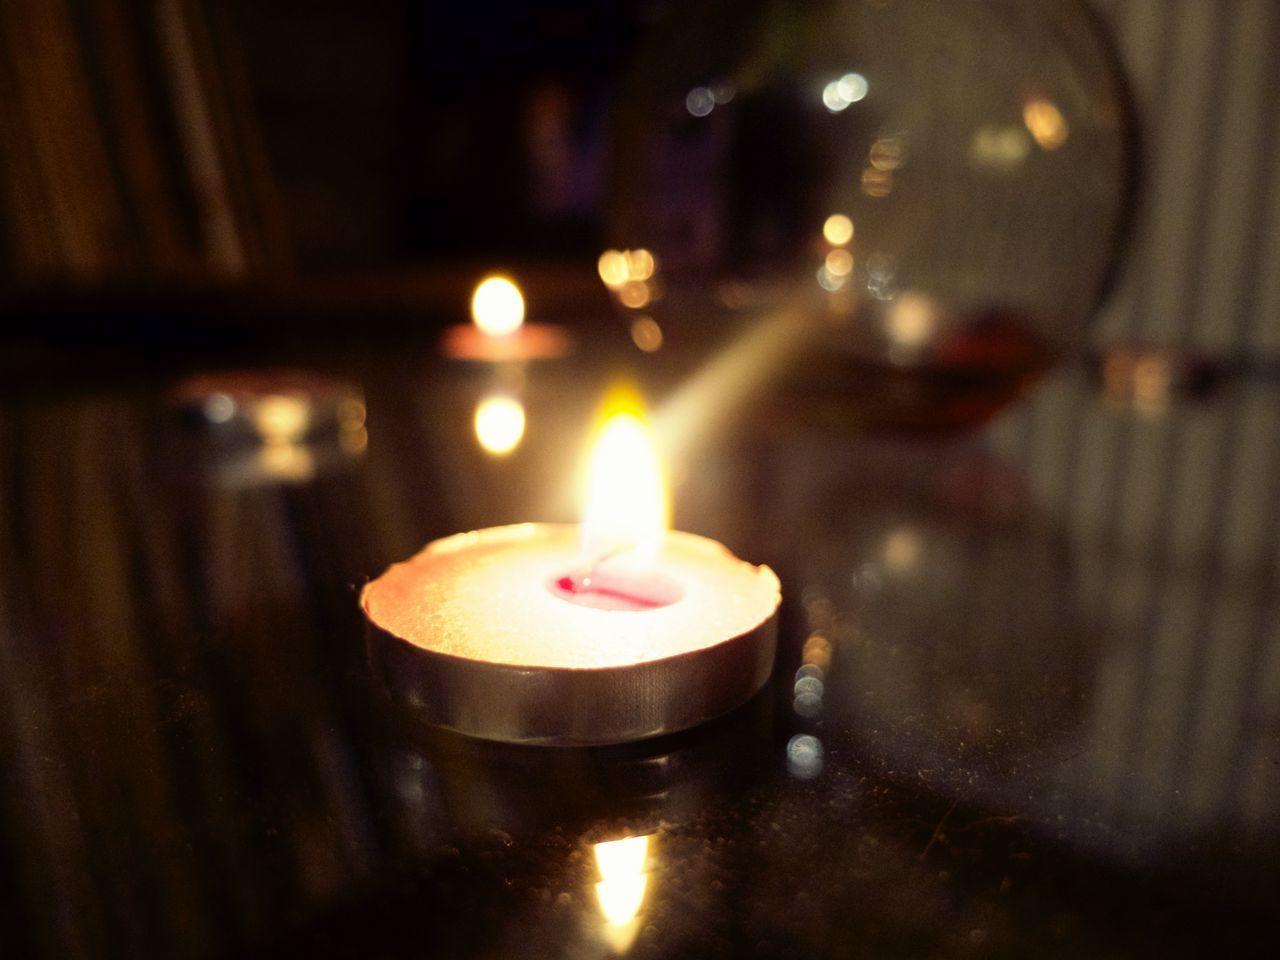 flame, candle, burning, tea light, indoors, heat - temperature, illuminated, no people, focus on foreground, close-up, night, diya - oil lamp